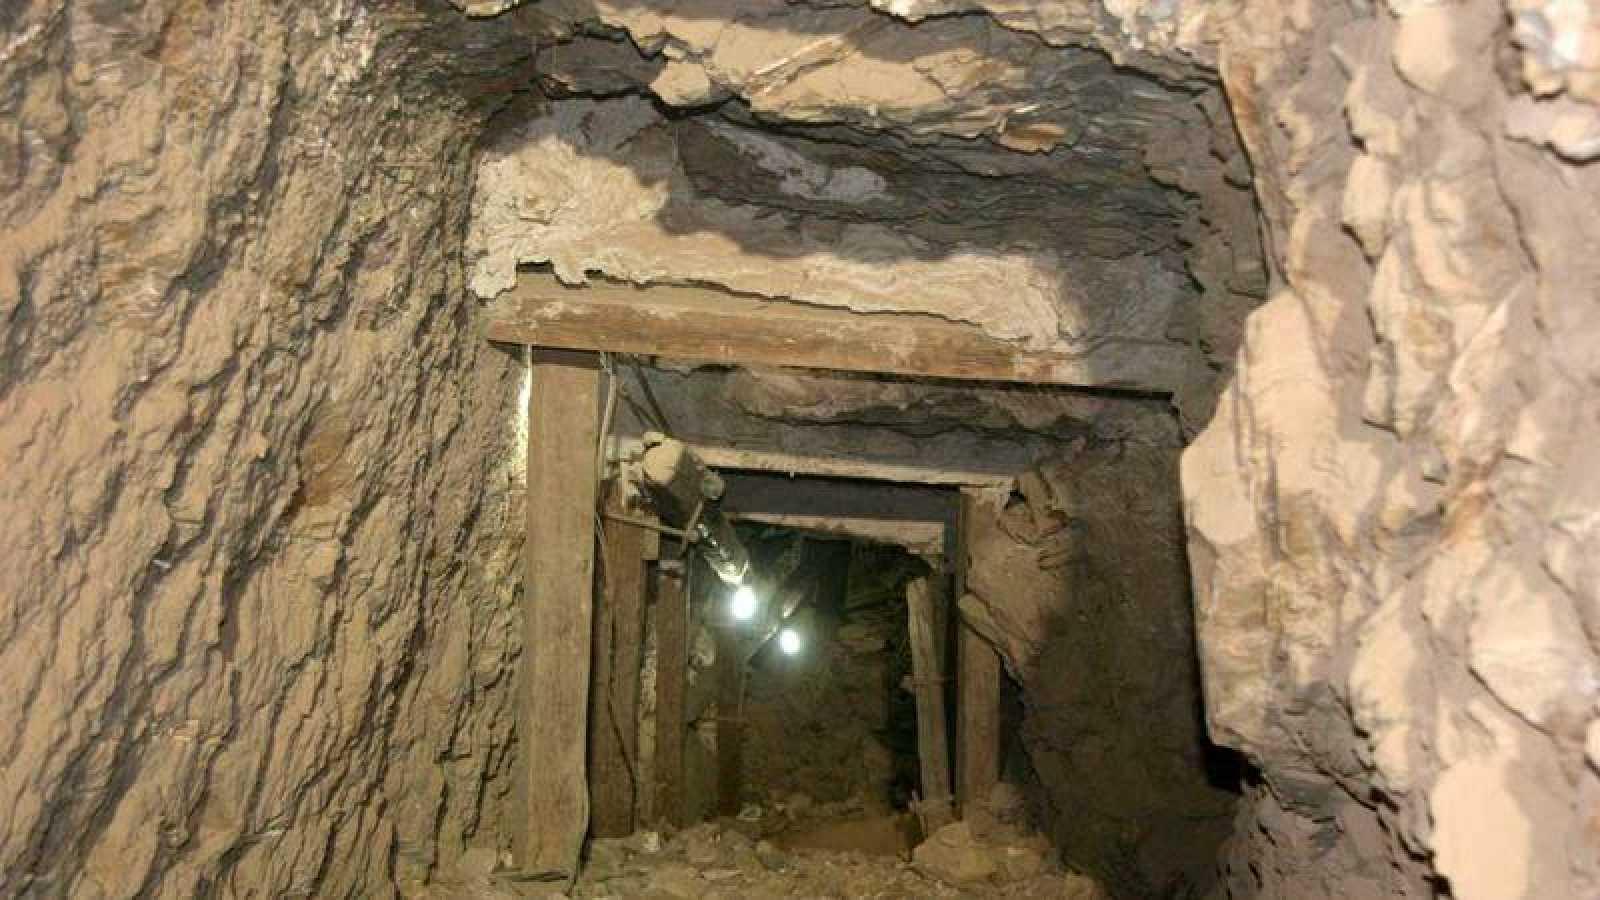 Vista de un túnel de la tumba de Seti I.